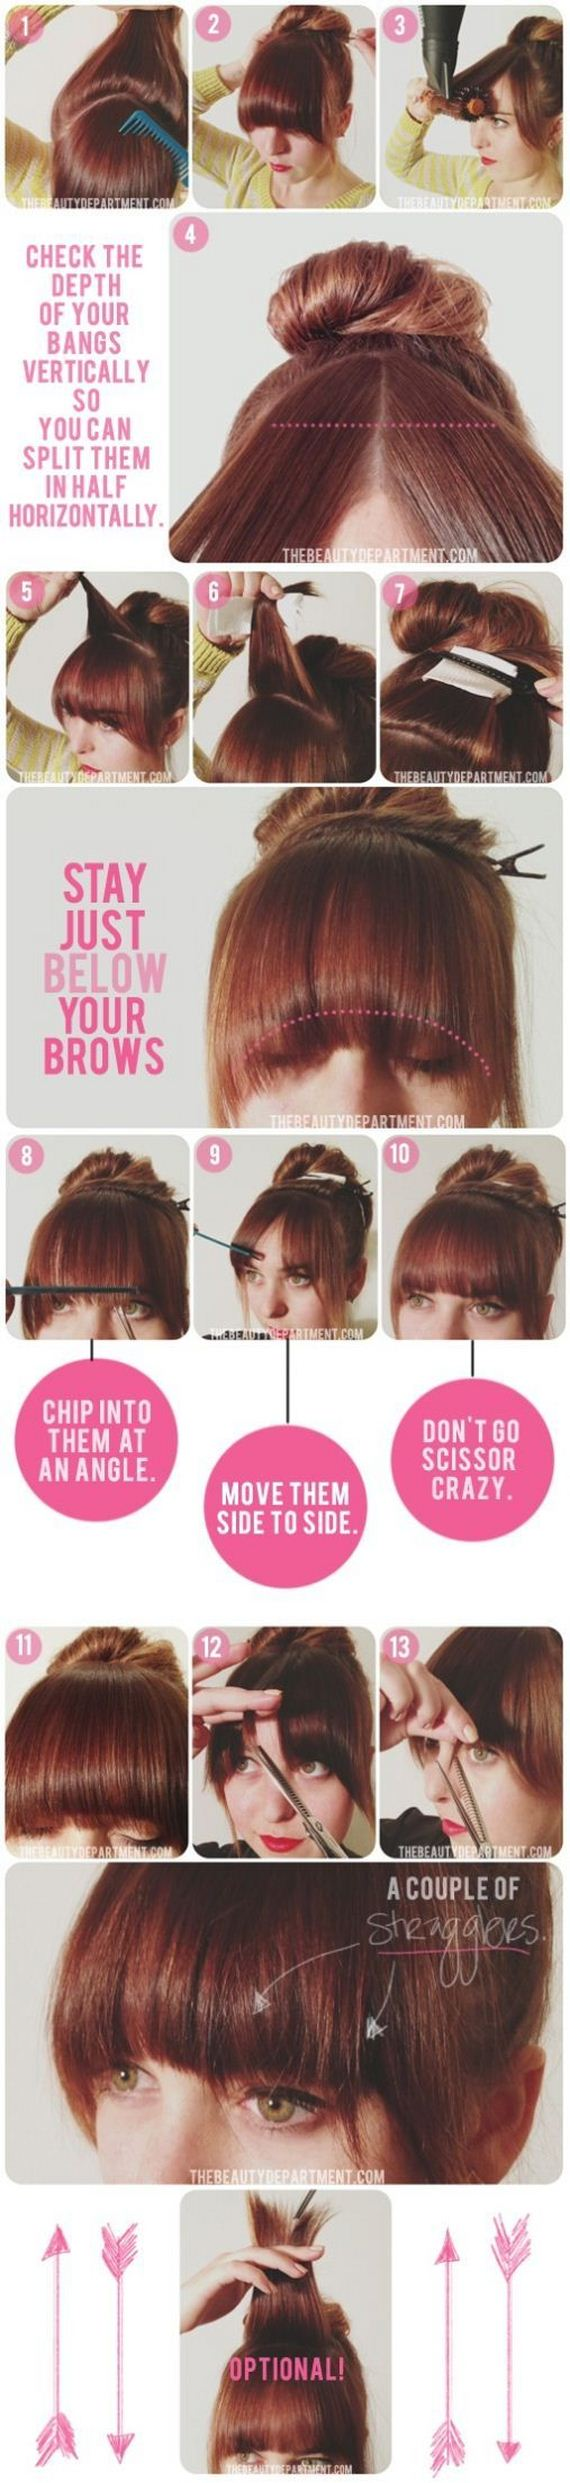 09-style-bangs